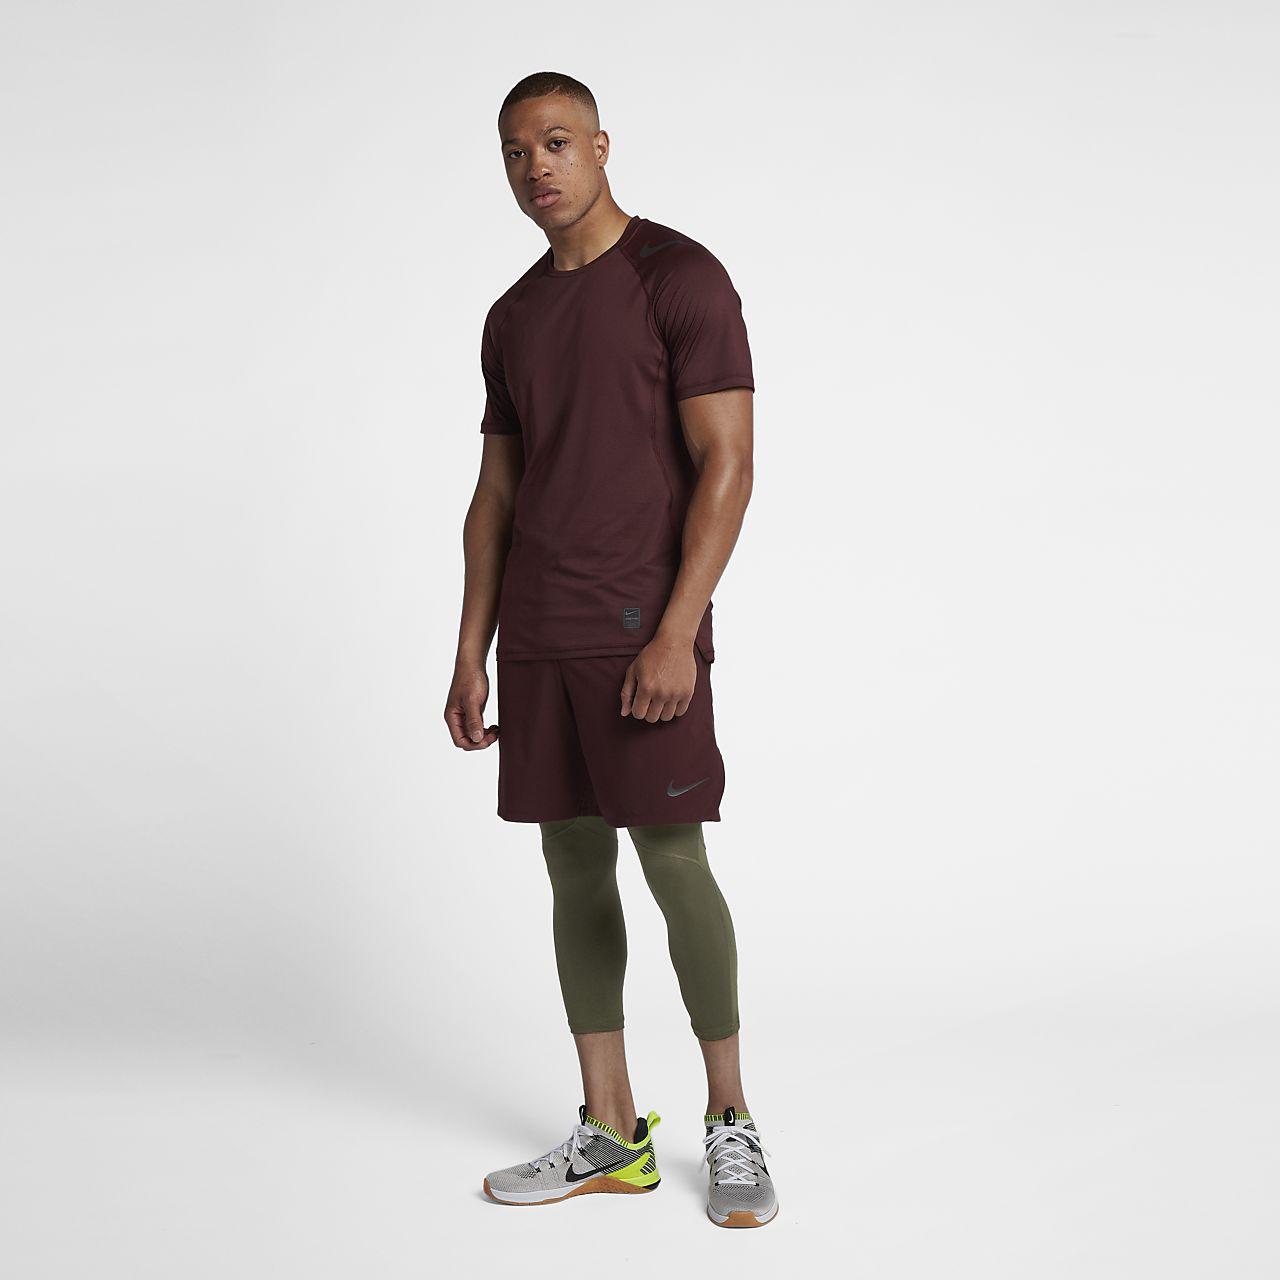 e0f3d446f692b1 Nike Pro HyperCool Men's 3/4 Training Tights. Nike.com ZA